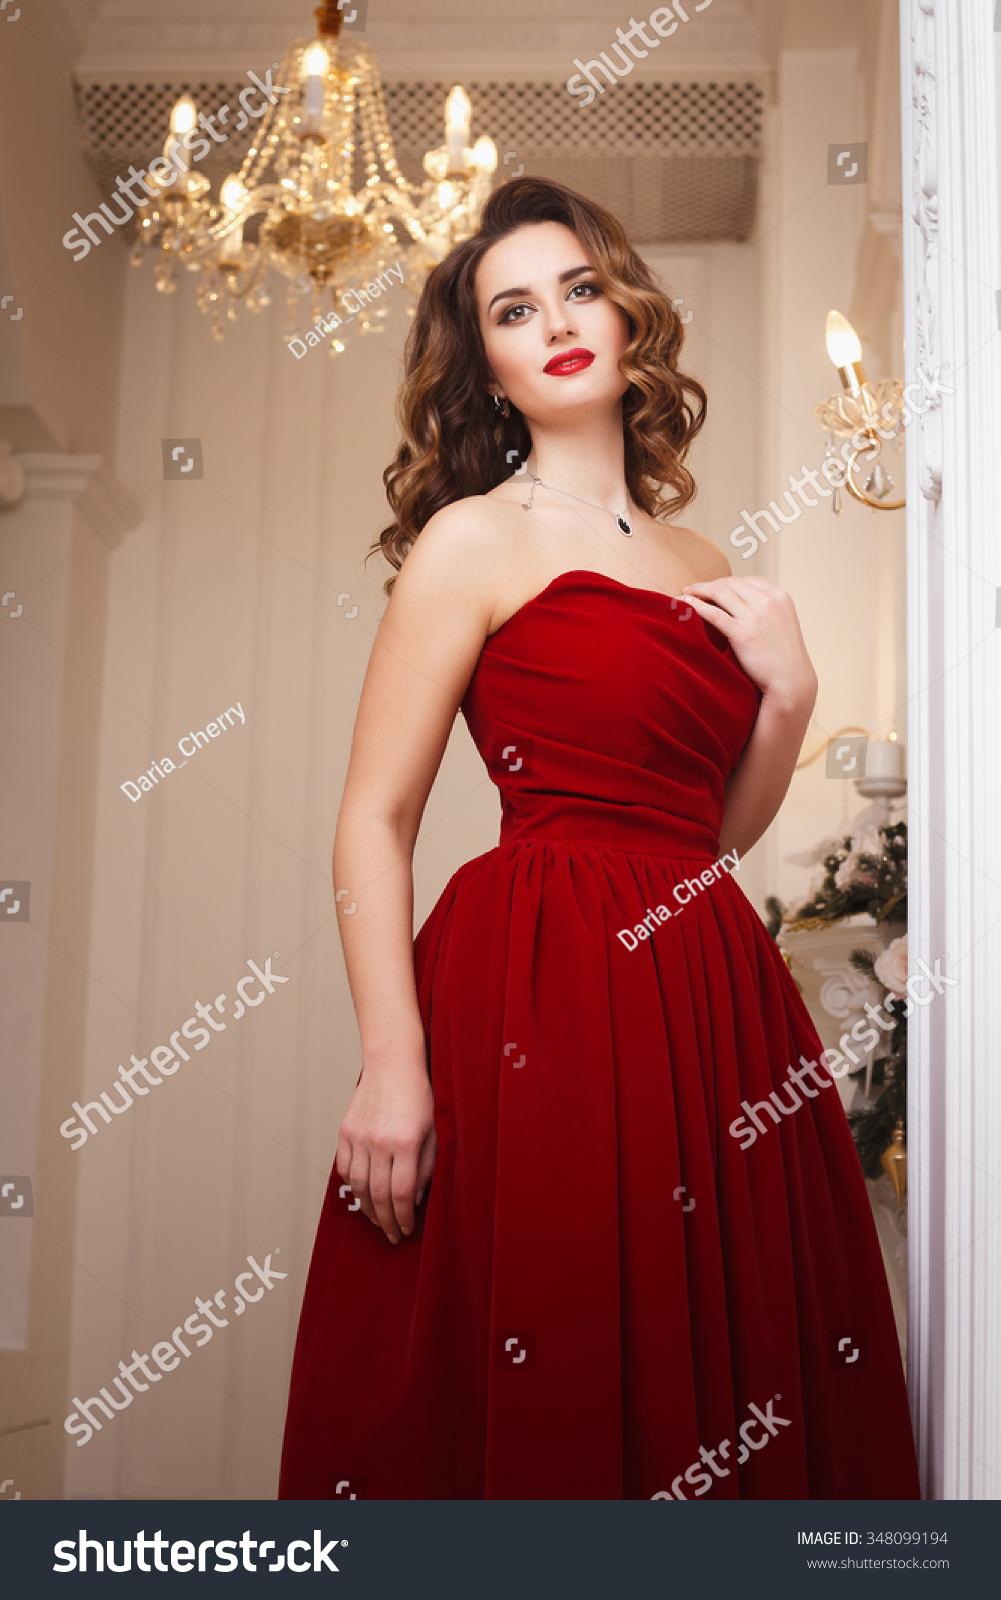 Beautiful Young Woman Perfect Make Hair Stock Photo (Royalty Free ...